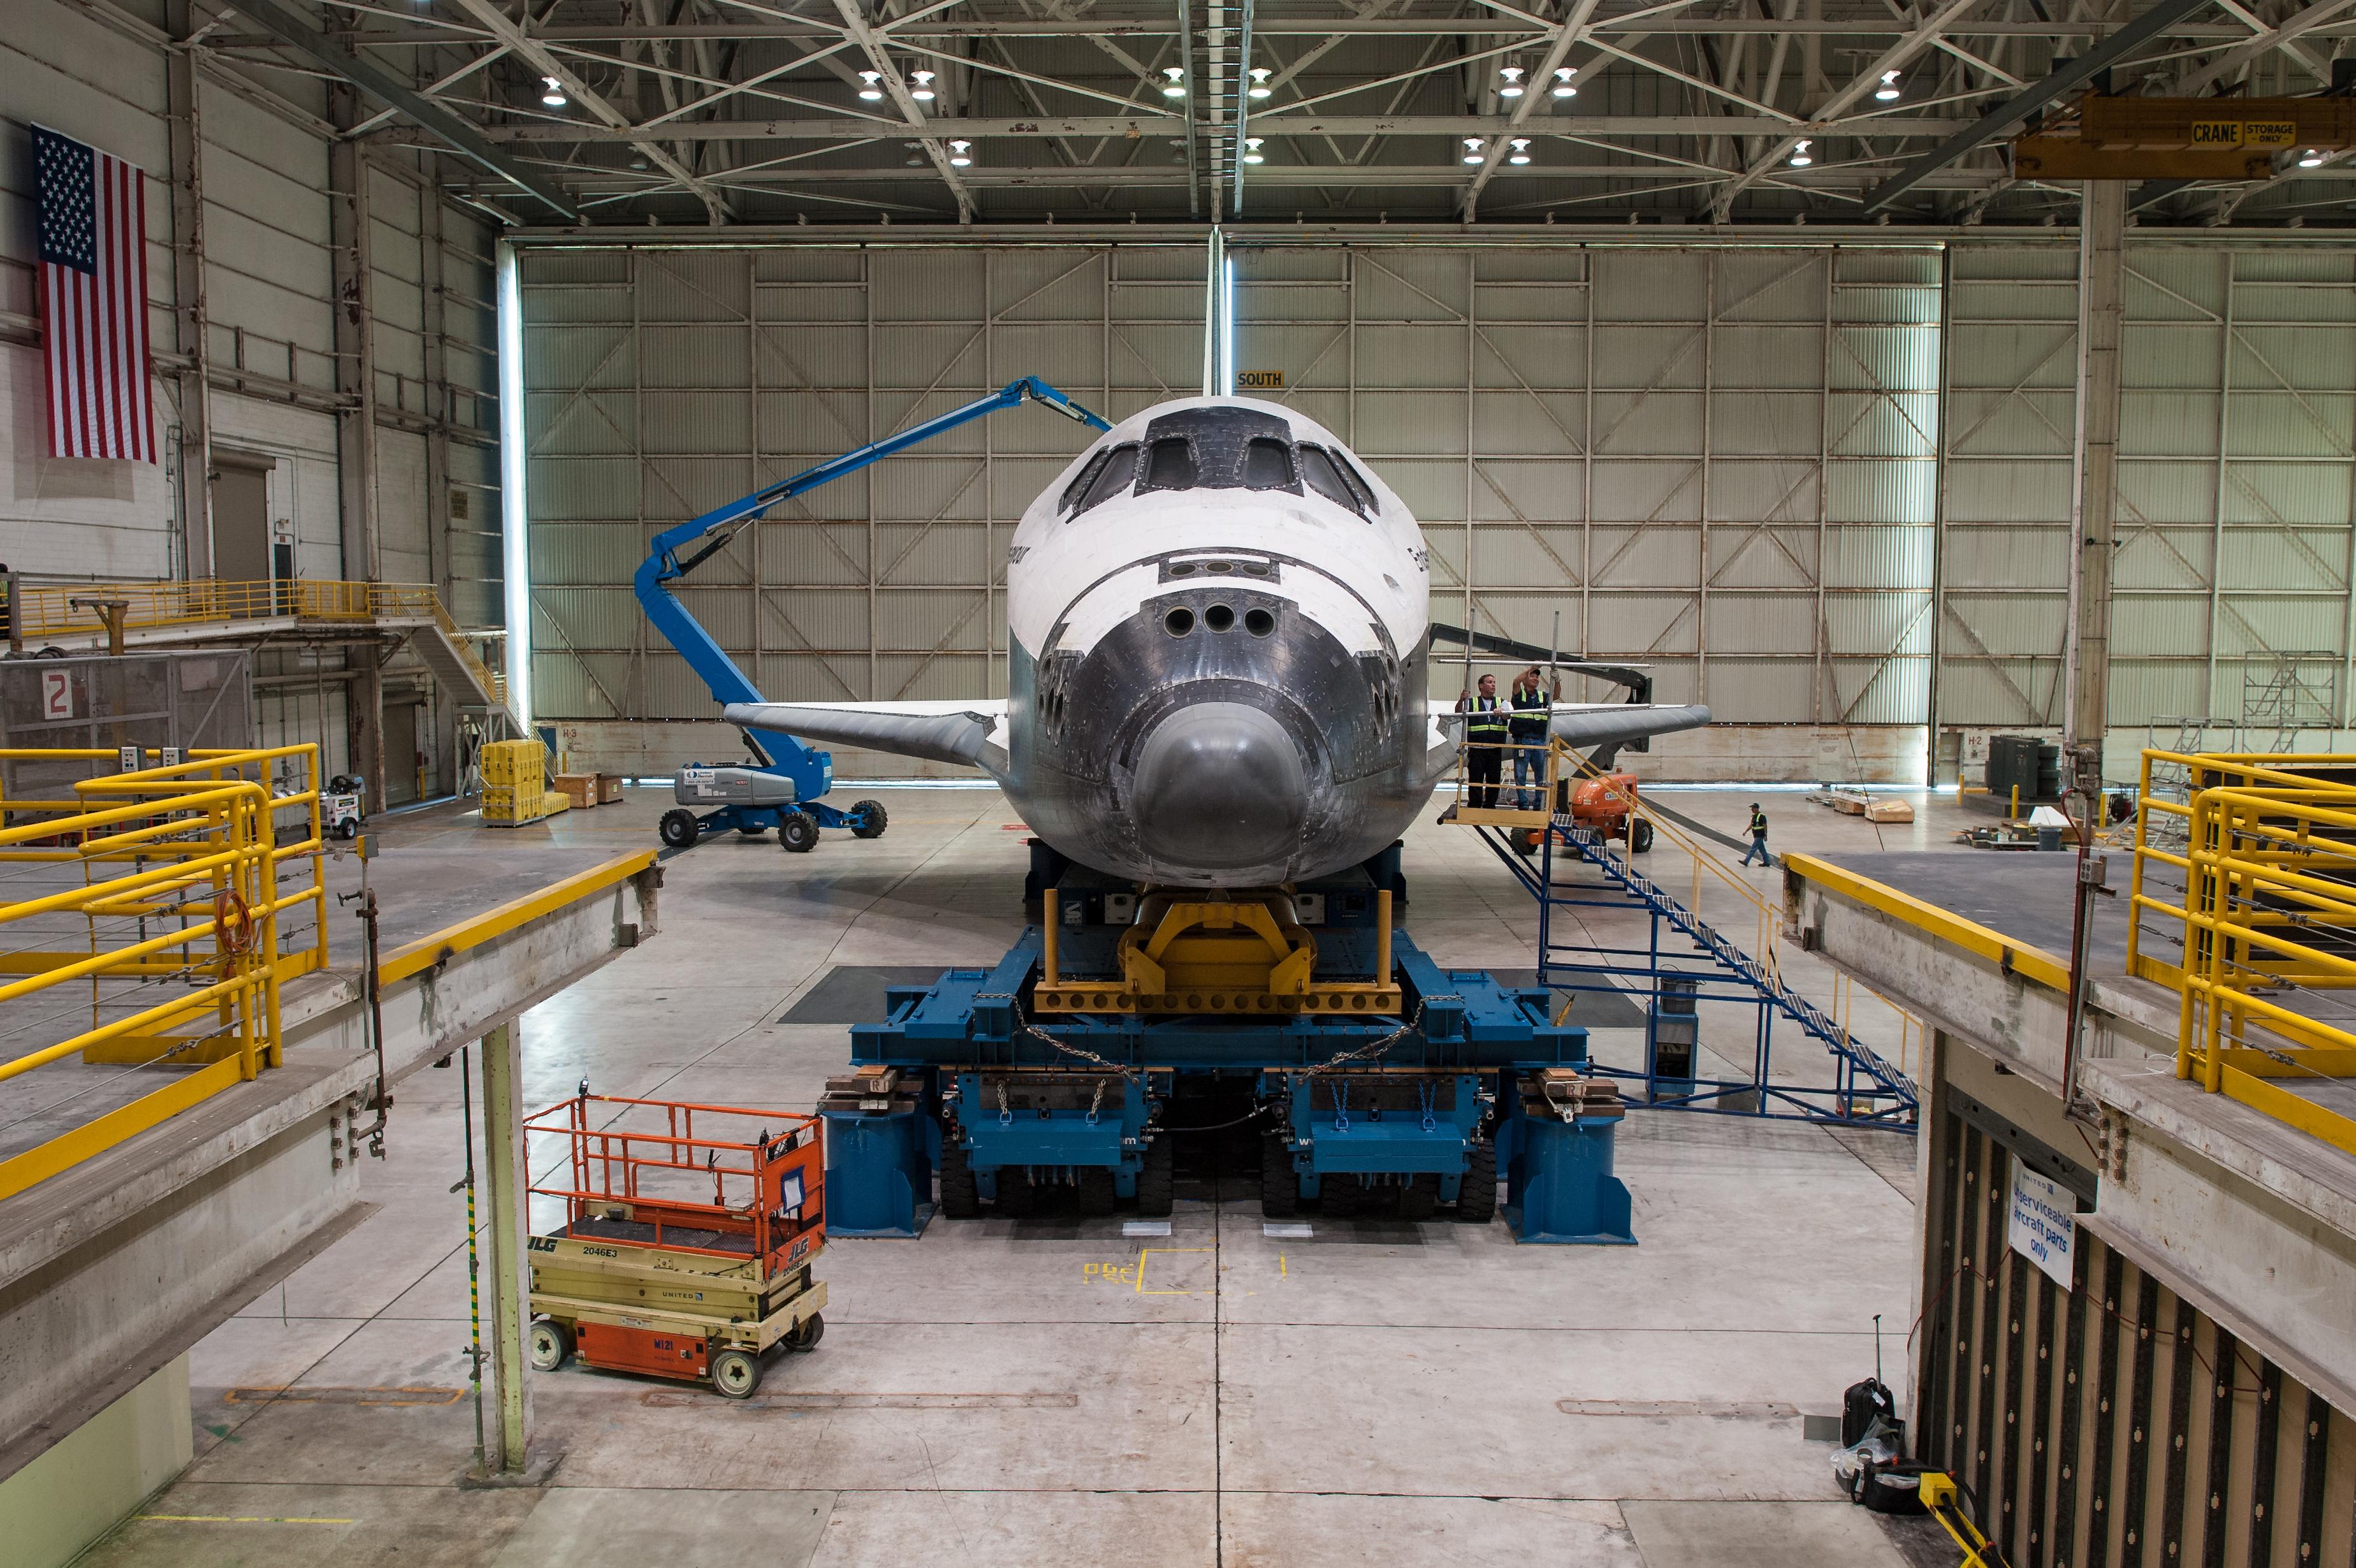 space shuttle endeavour size - photo #25